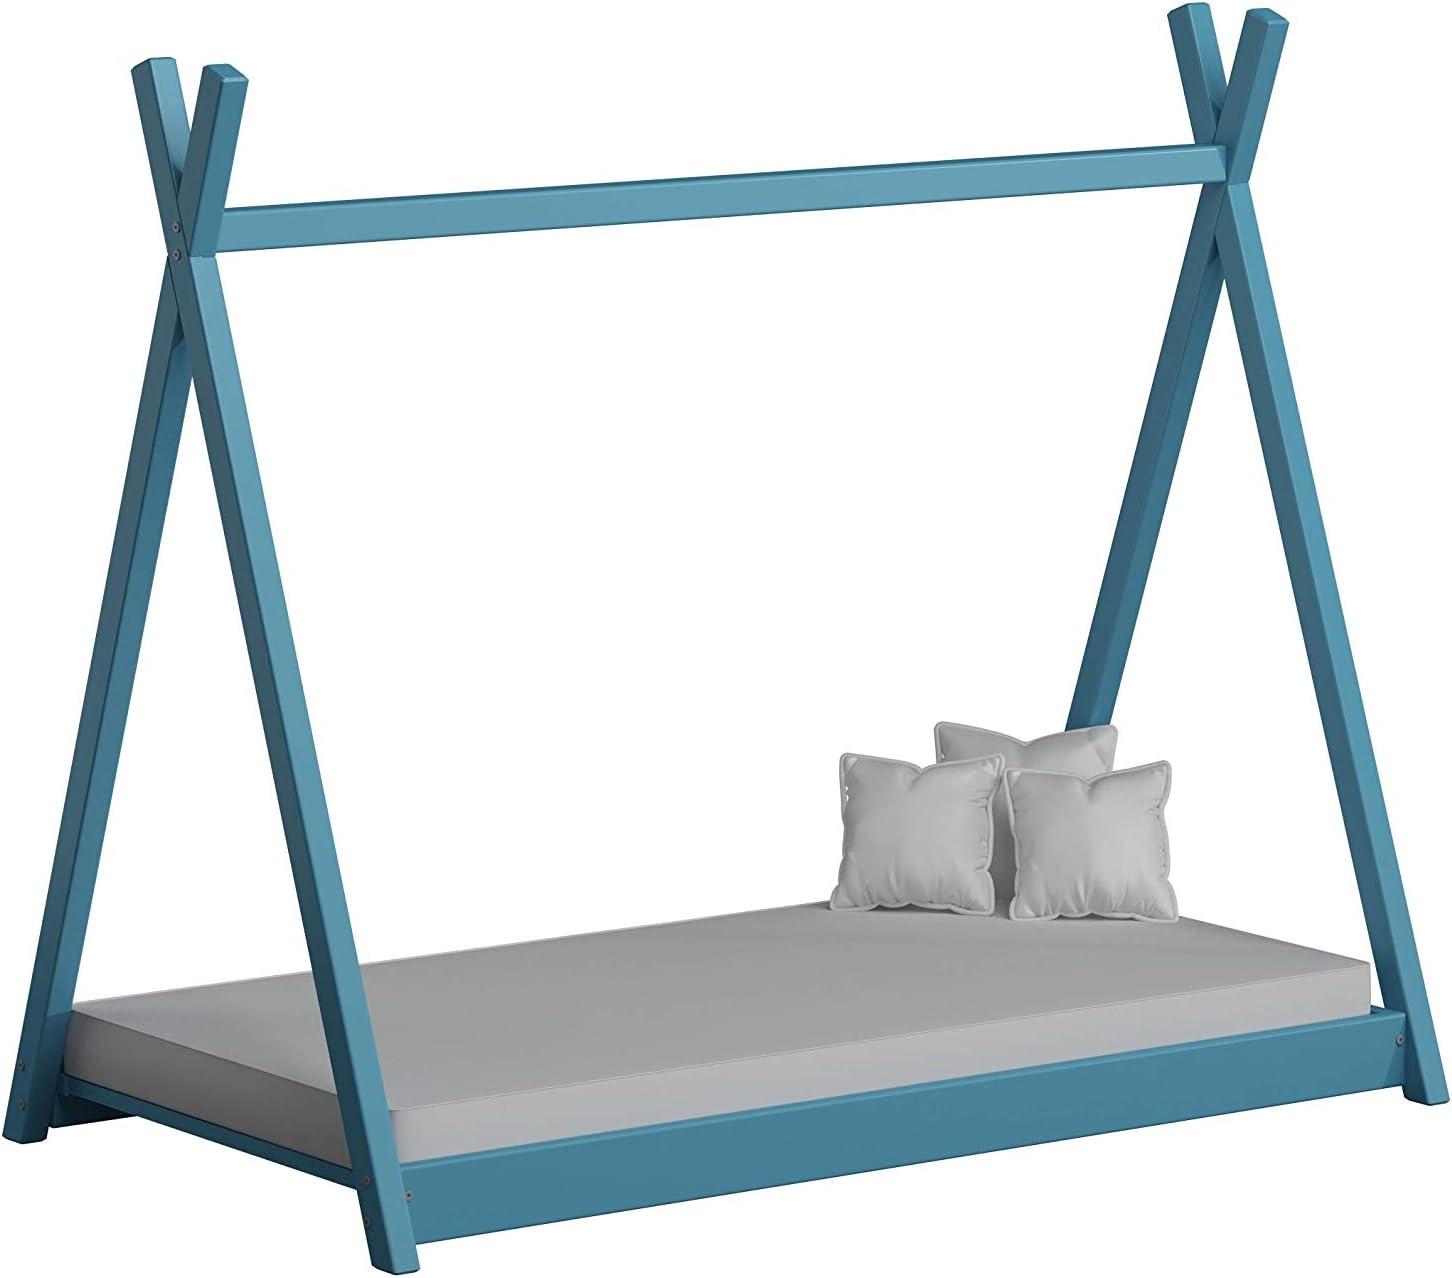 Natural, 70 x 140 cm ACMA Kids bed Children bed TIPI 100/% Pinewood Natural